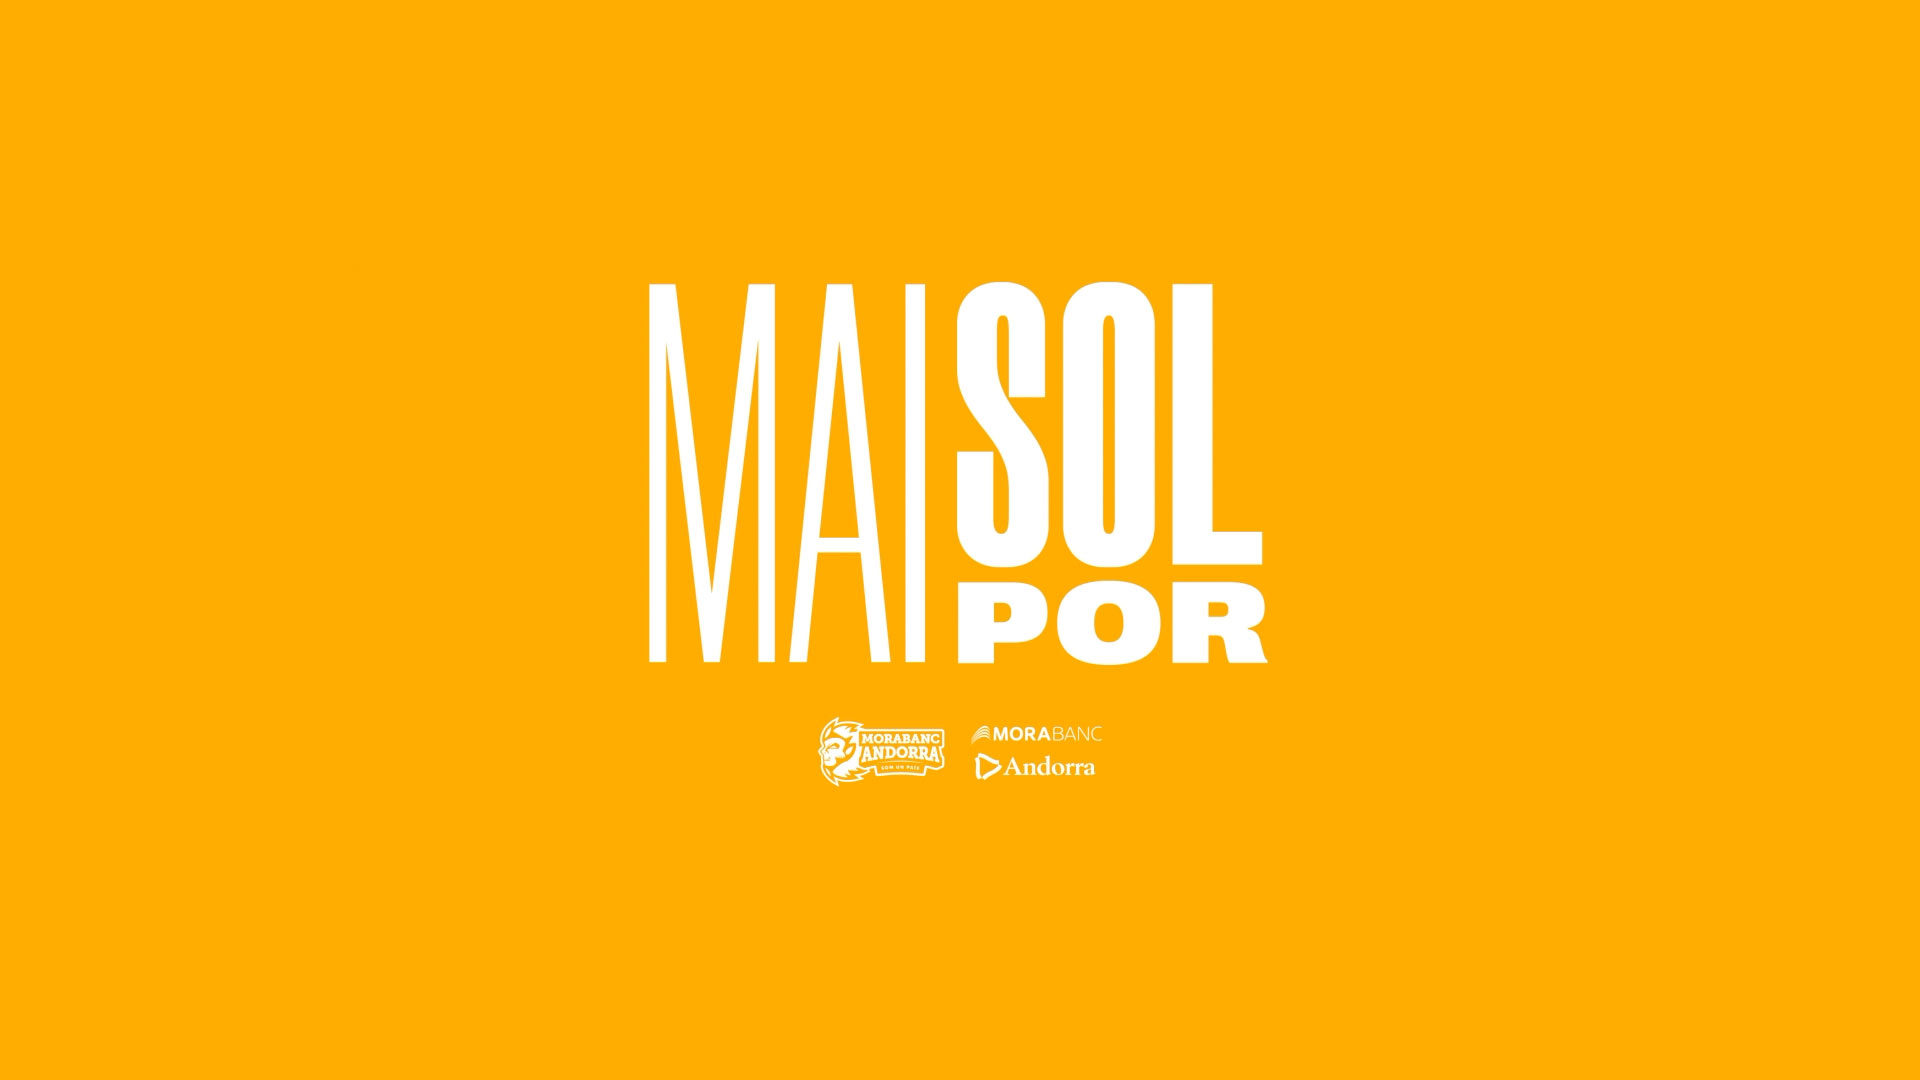 Diseño Marca Motion graphics Barcelona Campaña 20/21 Mai Sol